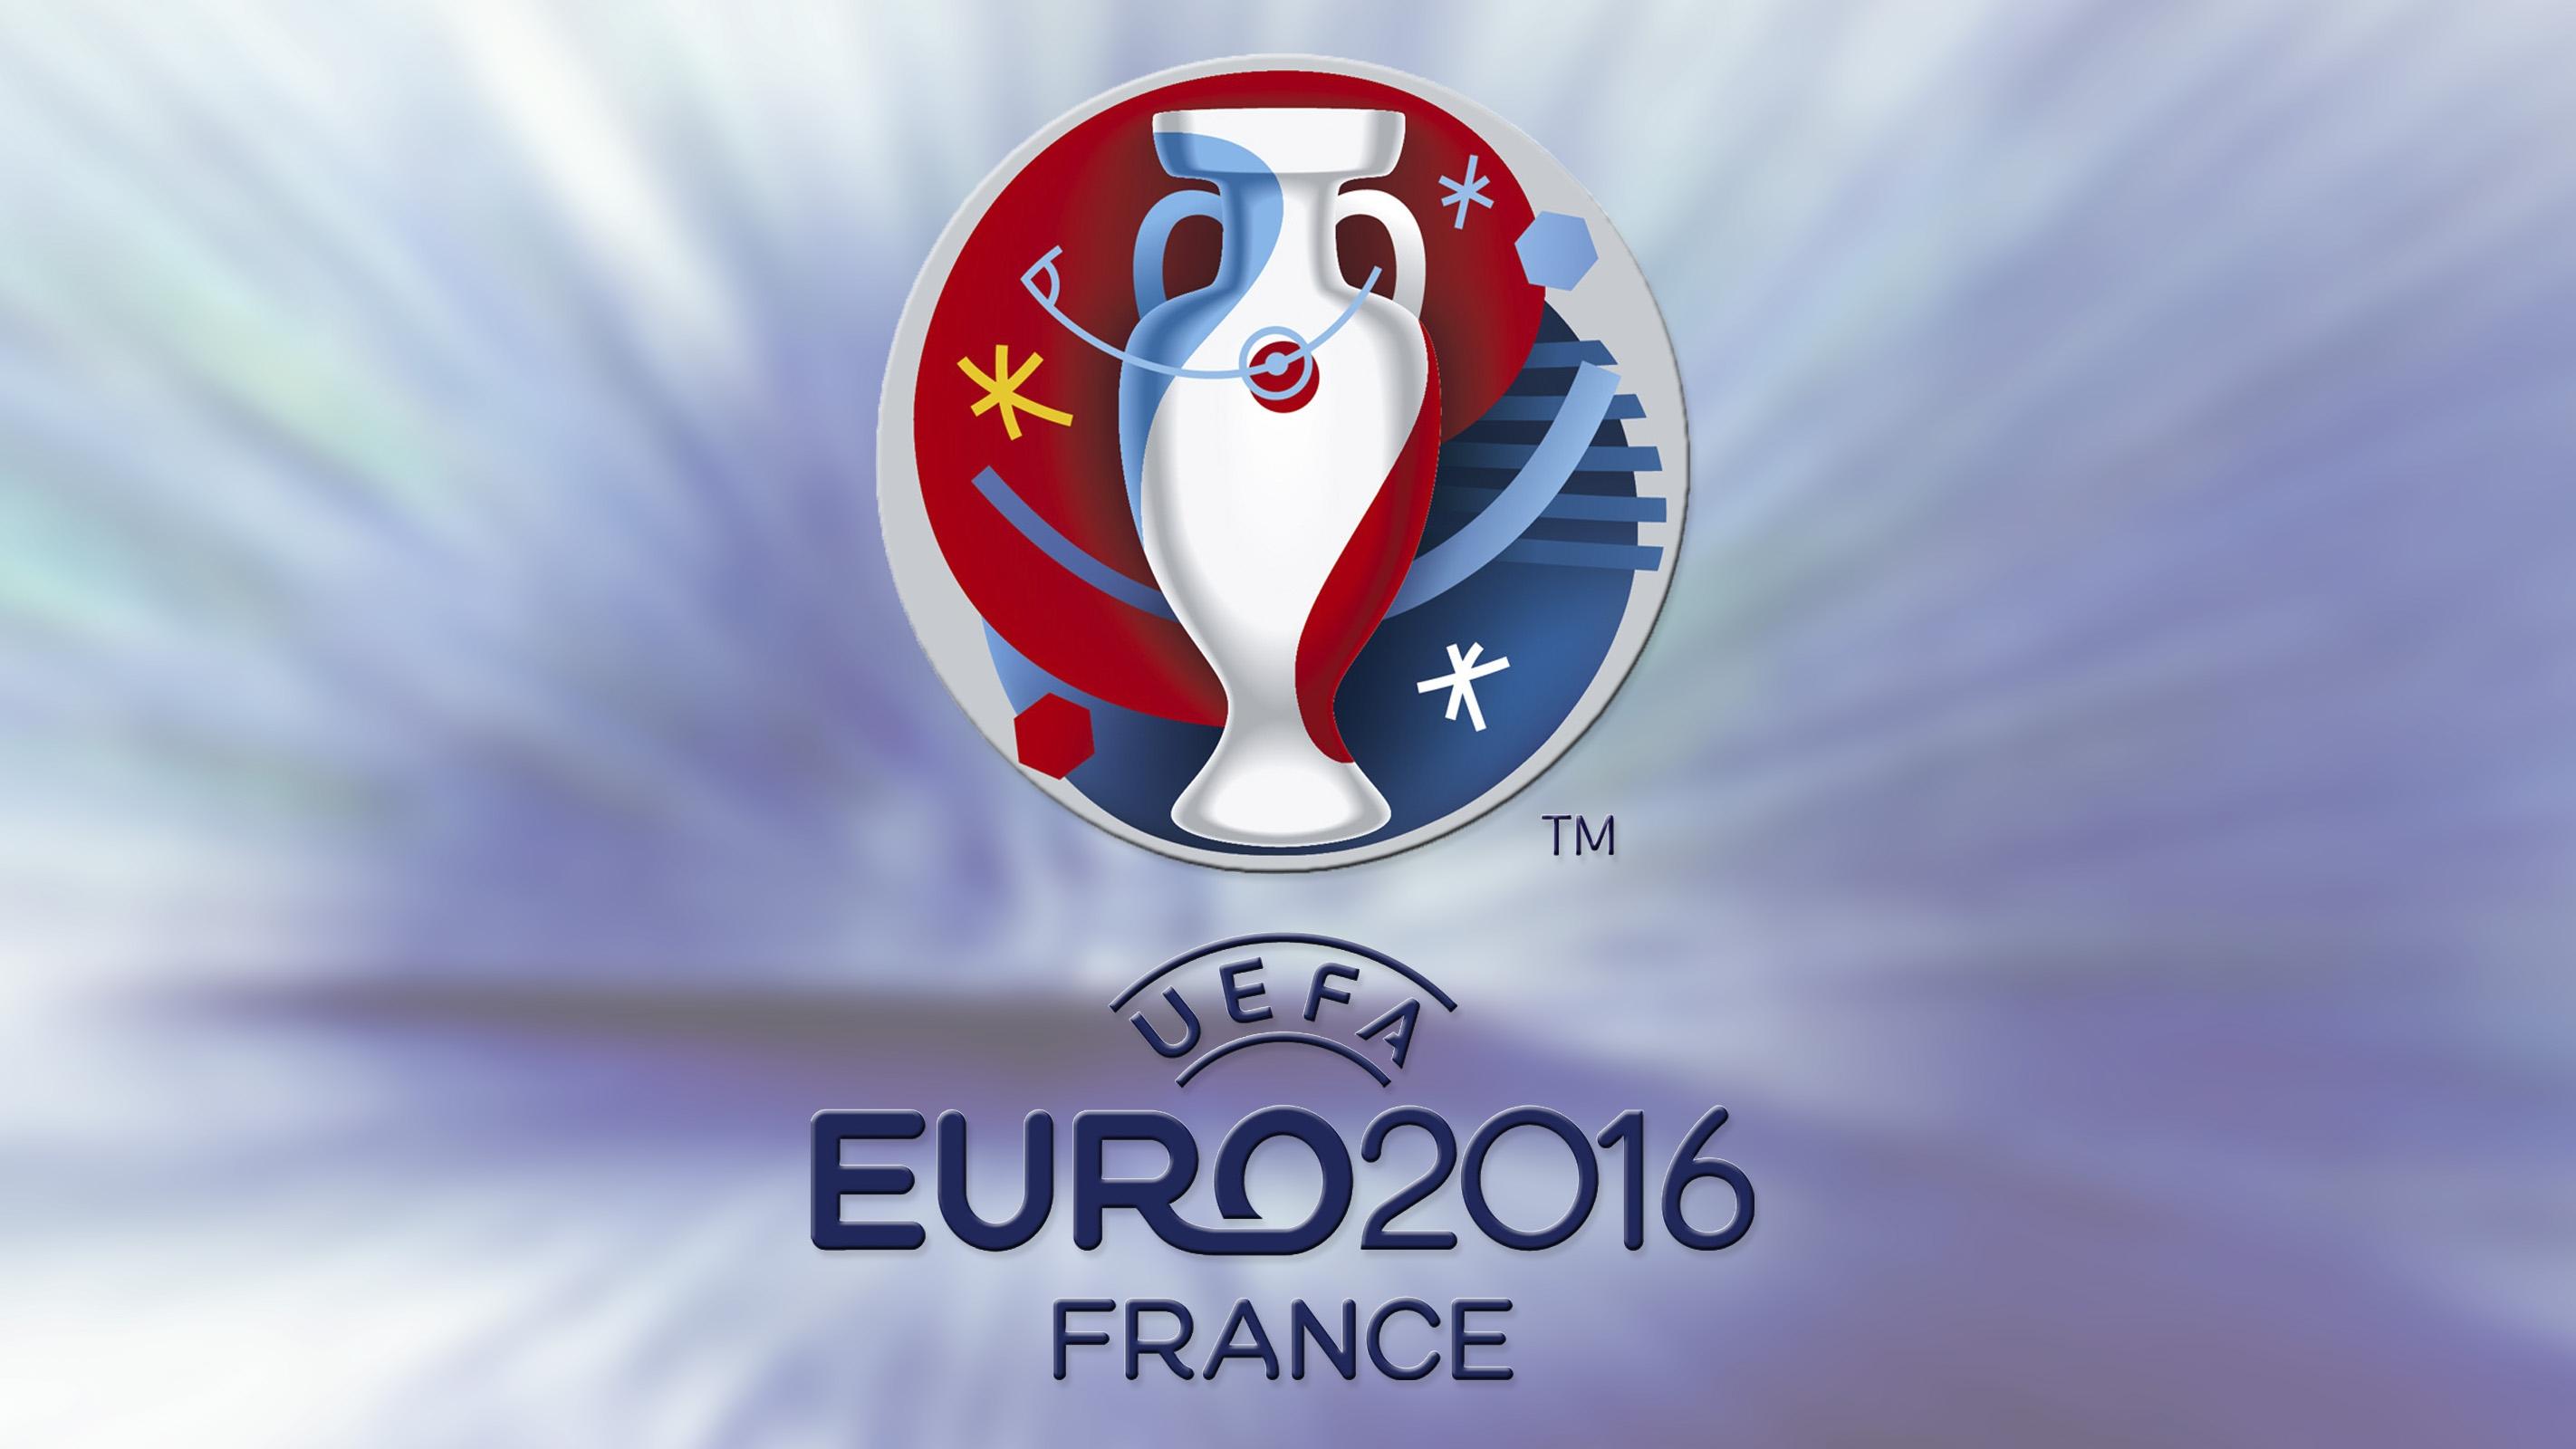 Euro 2016 HD Wallpaper